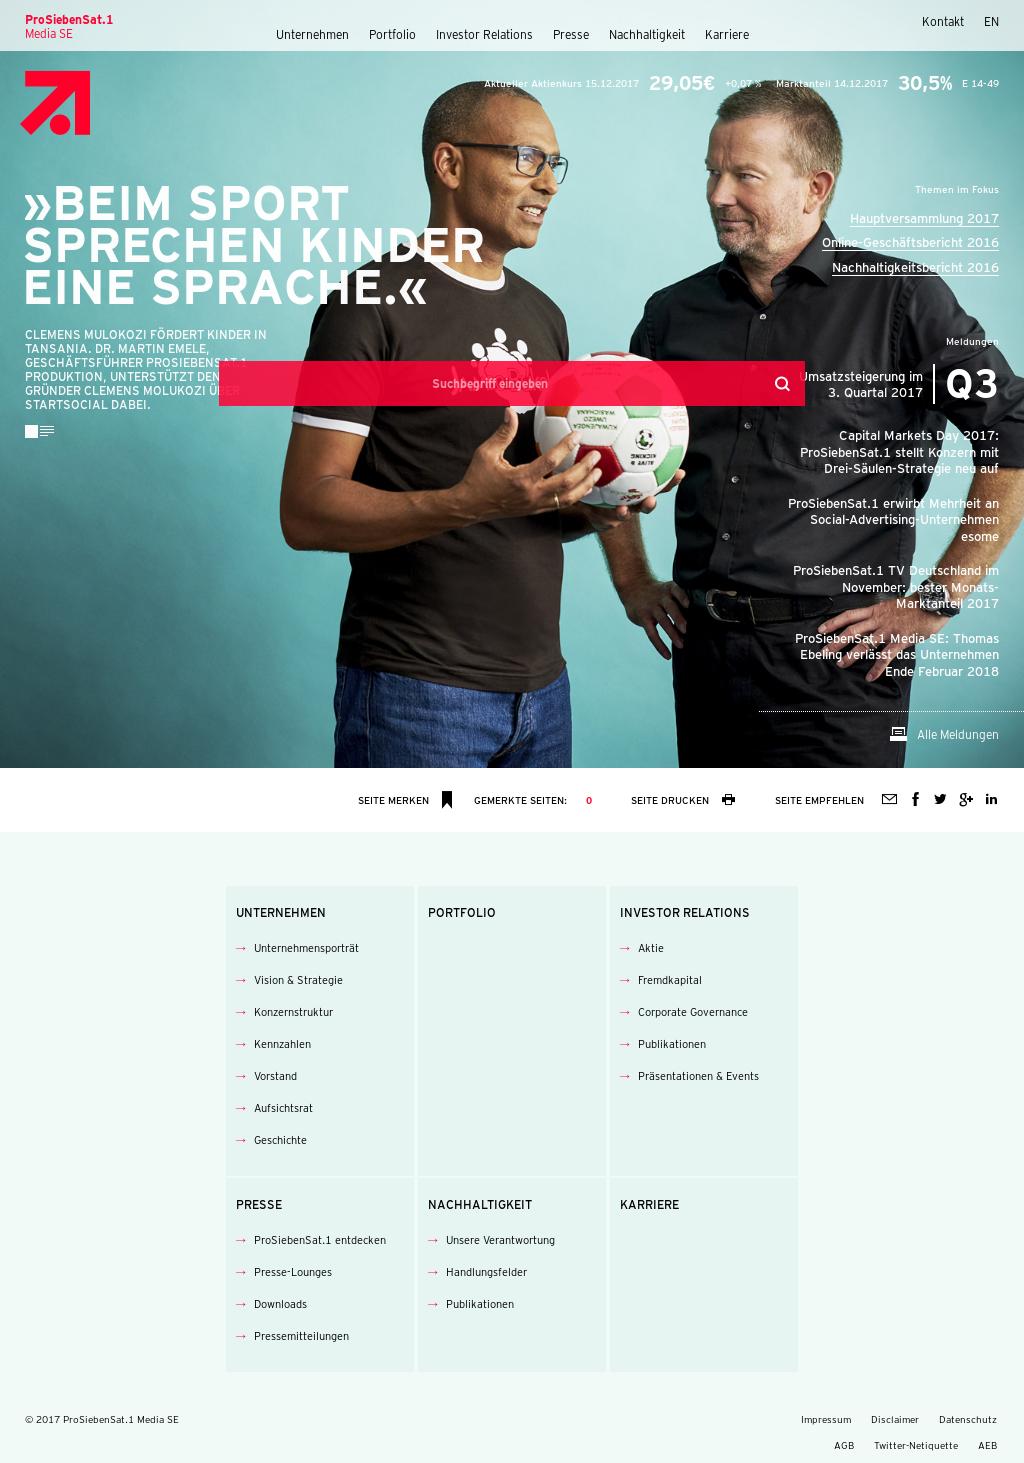 ProSiebenSat 1 Competitors, Revenue and Employees - Owler